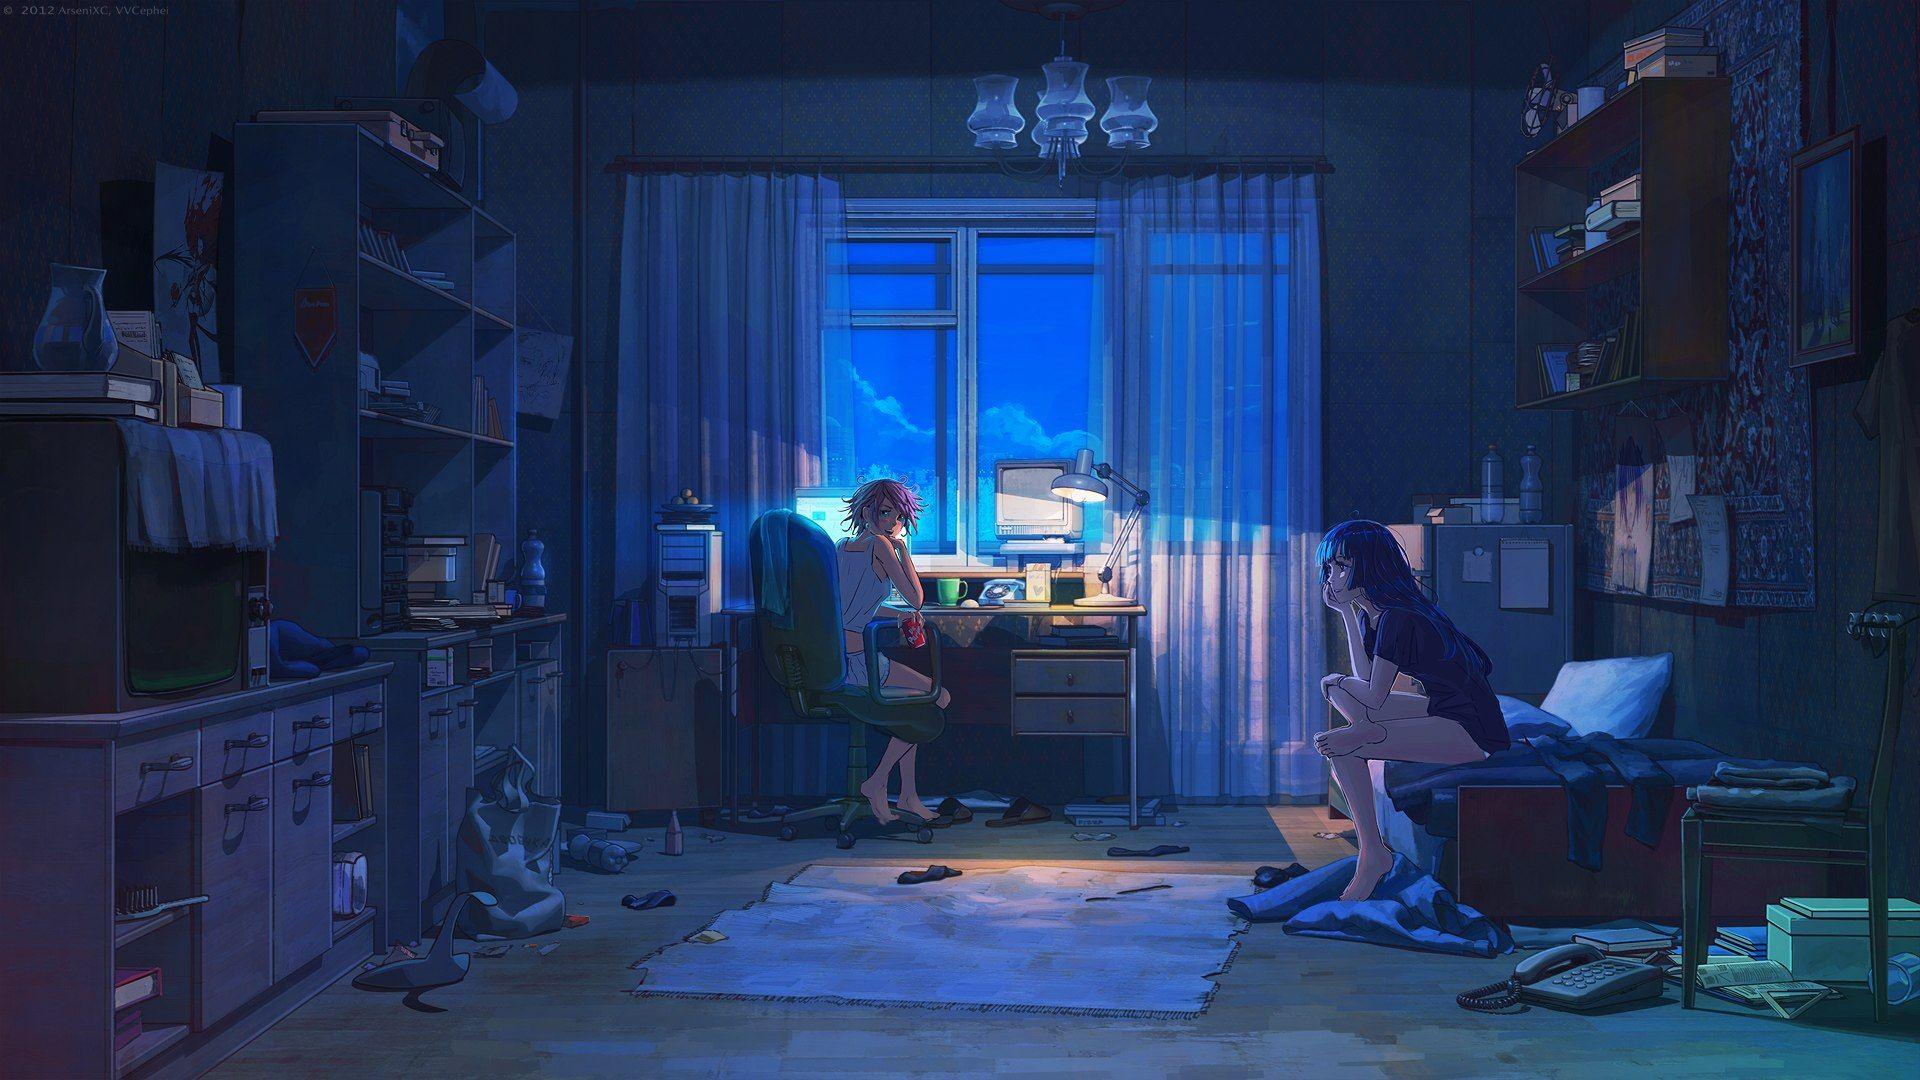 Bedroom House Anime Scenery Background Wallpaper Anime